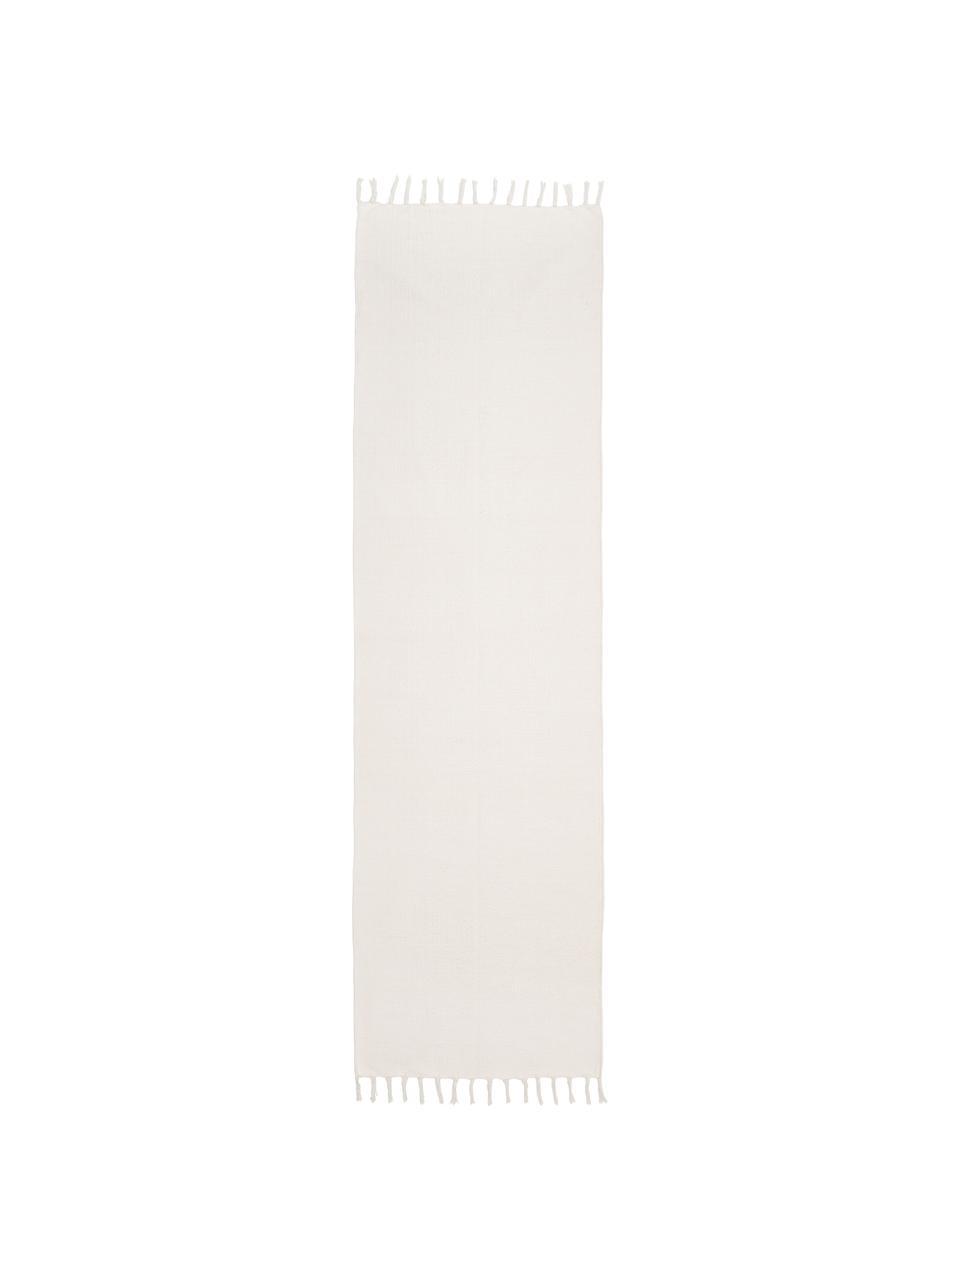 Tapis de couloir fin crème tissé main Agneta, Blanc